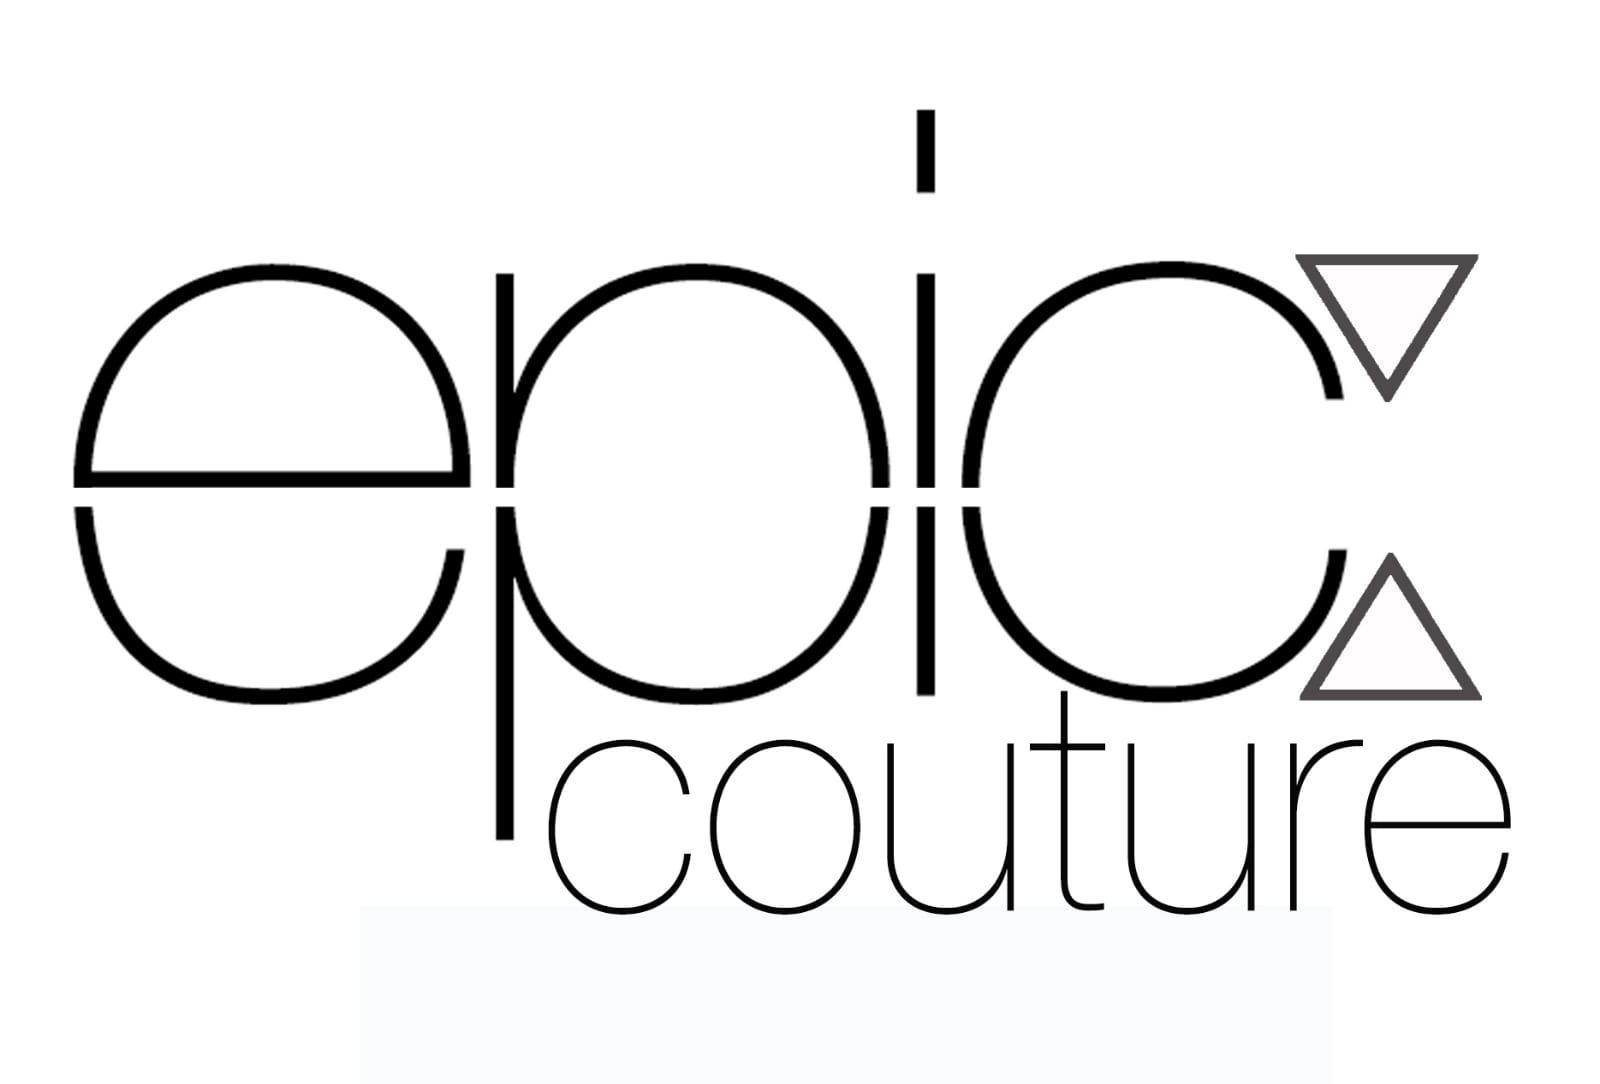 epic-couture Logo